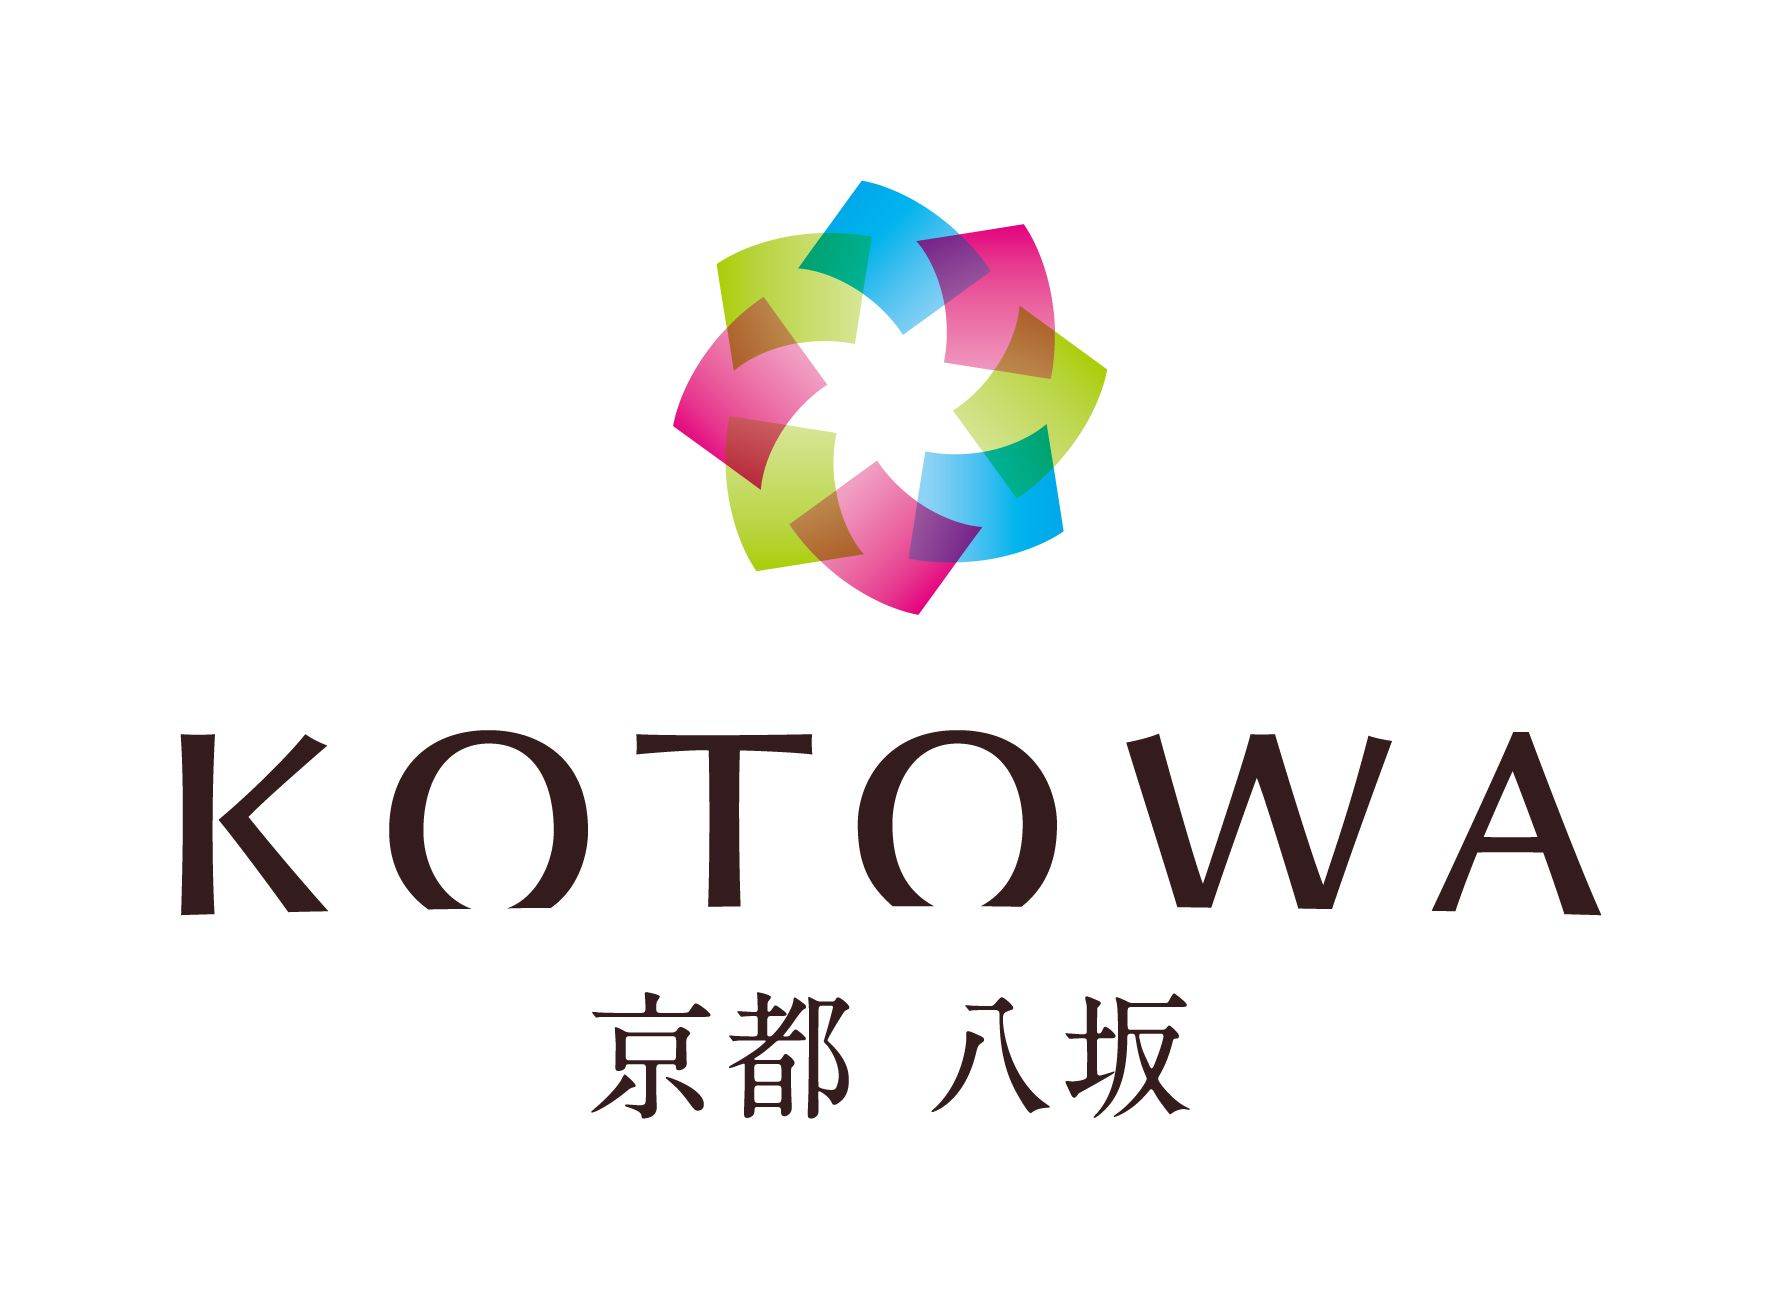 KOTOWA 京都 八坂(コトワ 京都 八坂)